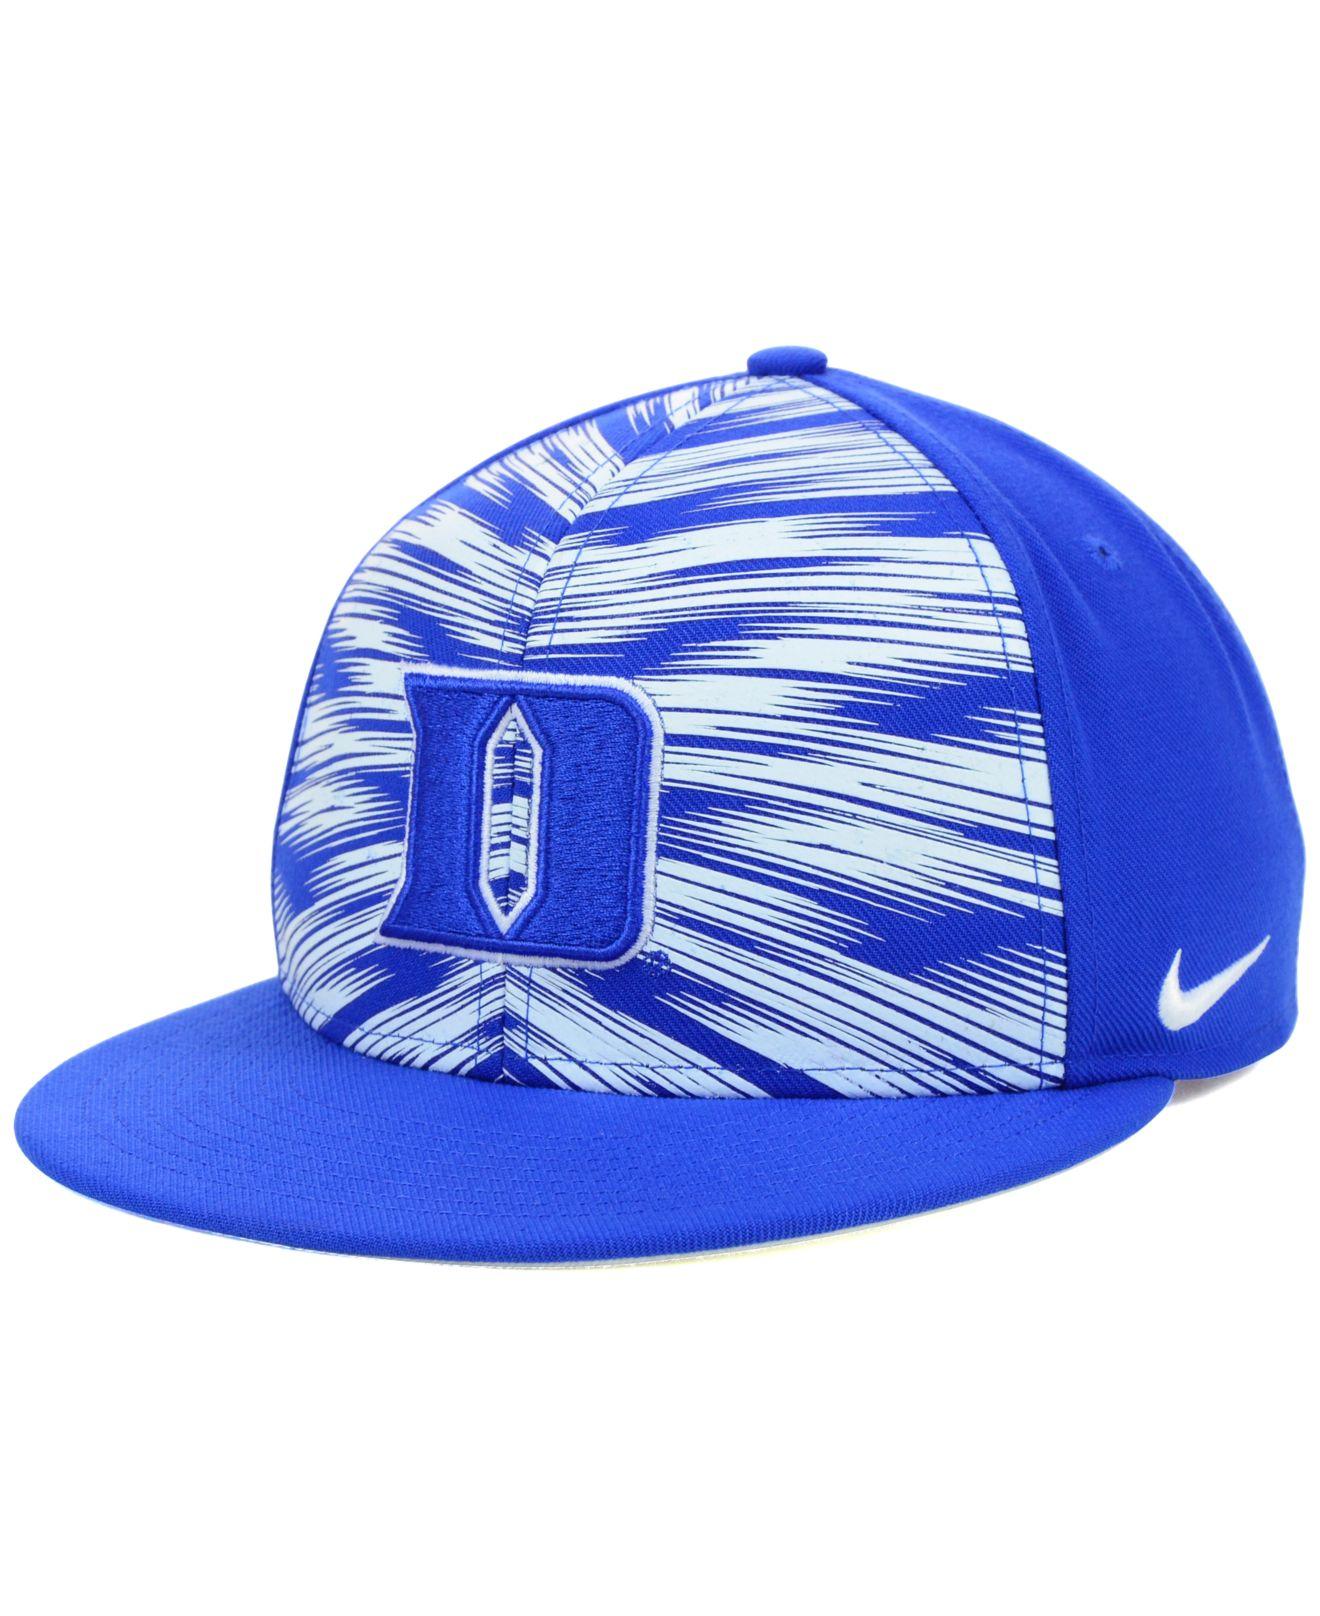 best sneakers e5f57 b6ae6 Lyst - Nike Duke Blue Devils Game Day Snapback Cap in Blue for Men